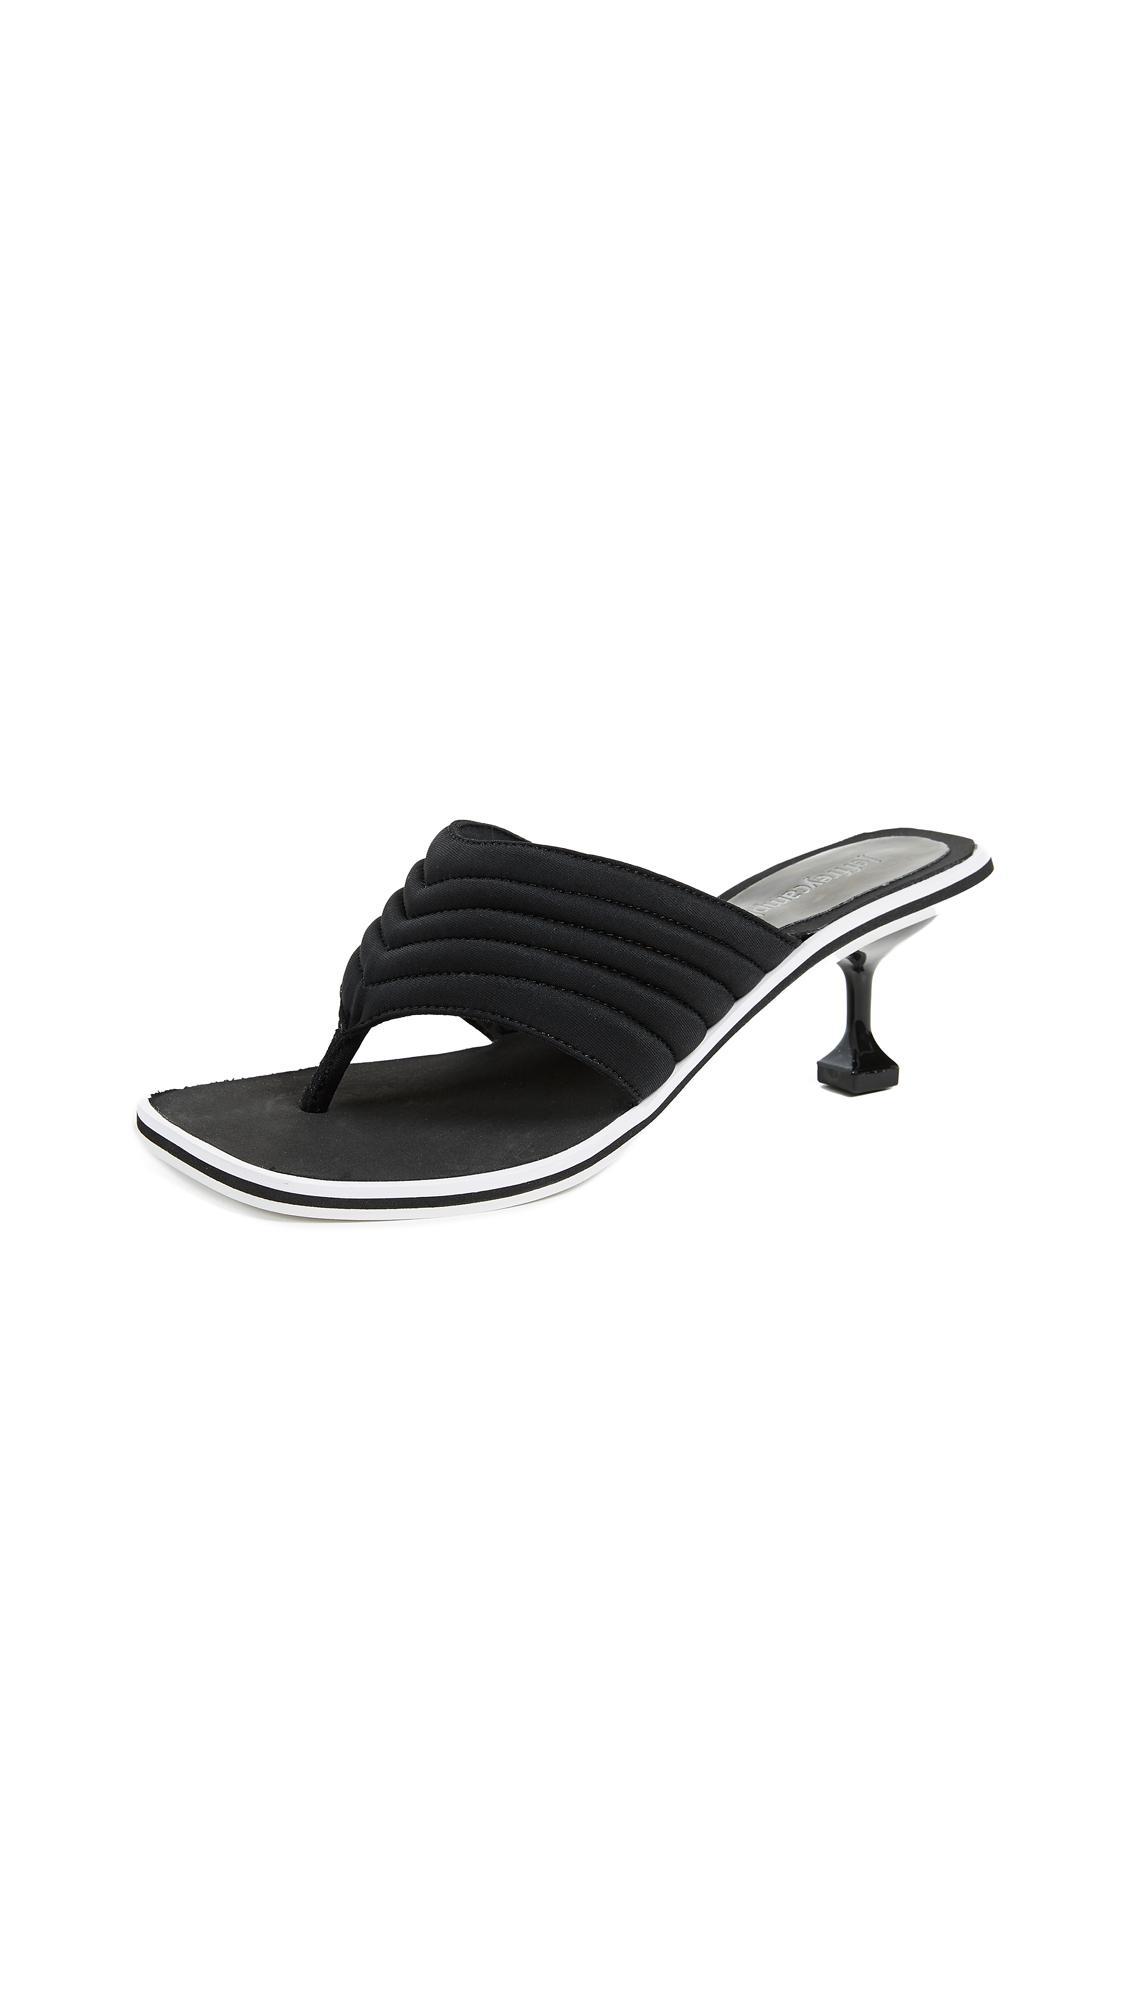 3fdf035885fe Jeffrey Campbell Overtime Kitten Heel Flip Flops in Black - Lyst